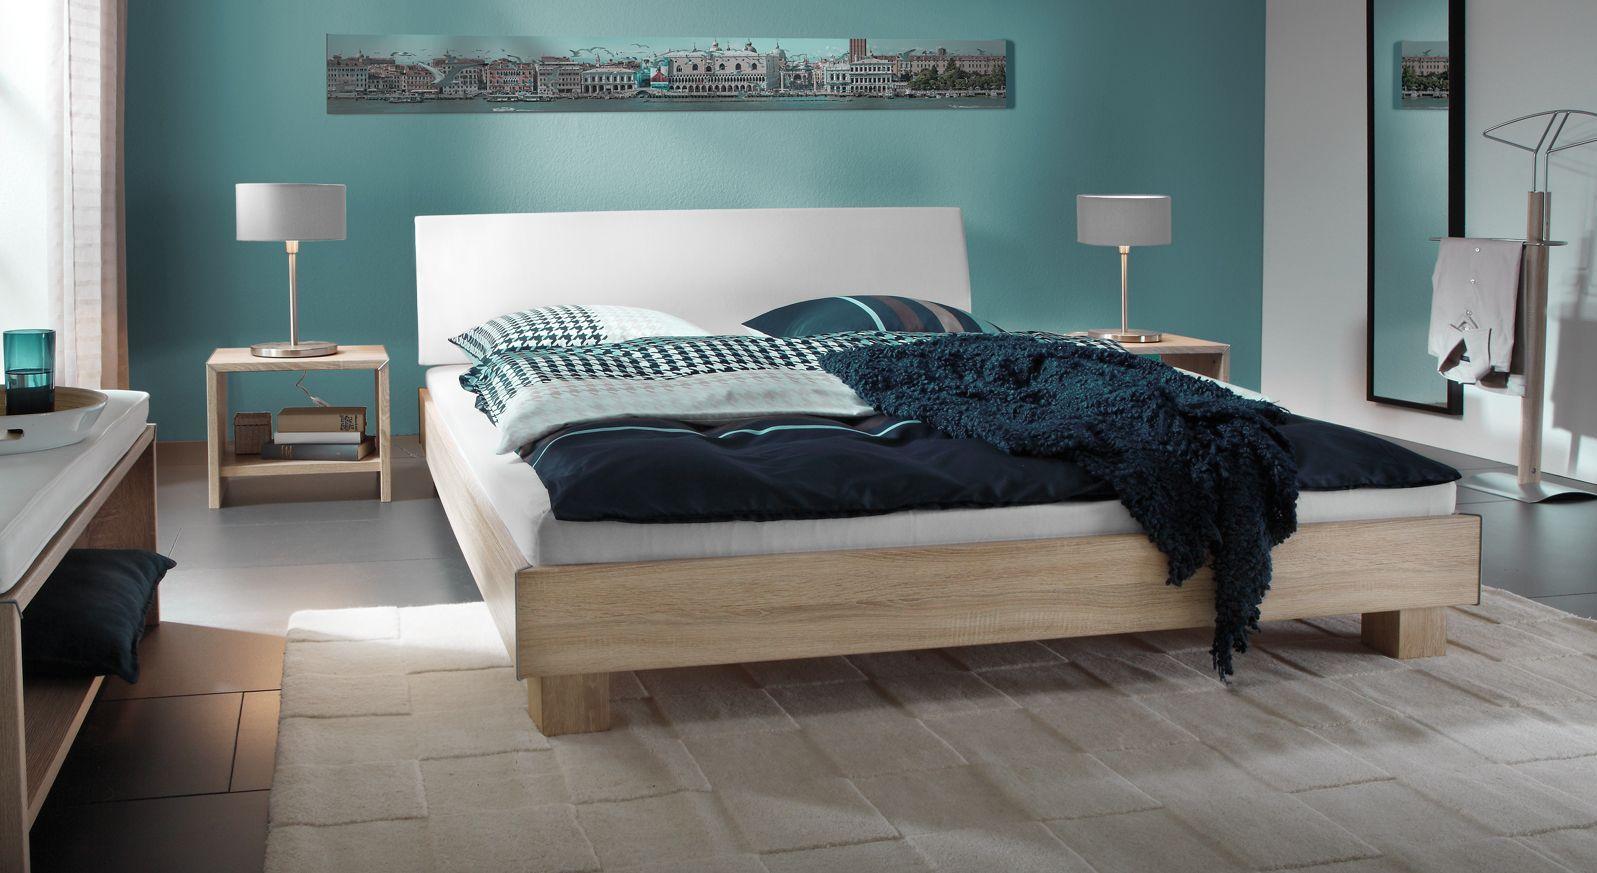 Bett 200x200 mit stabilen Blockfüßen